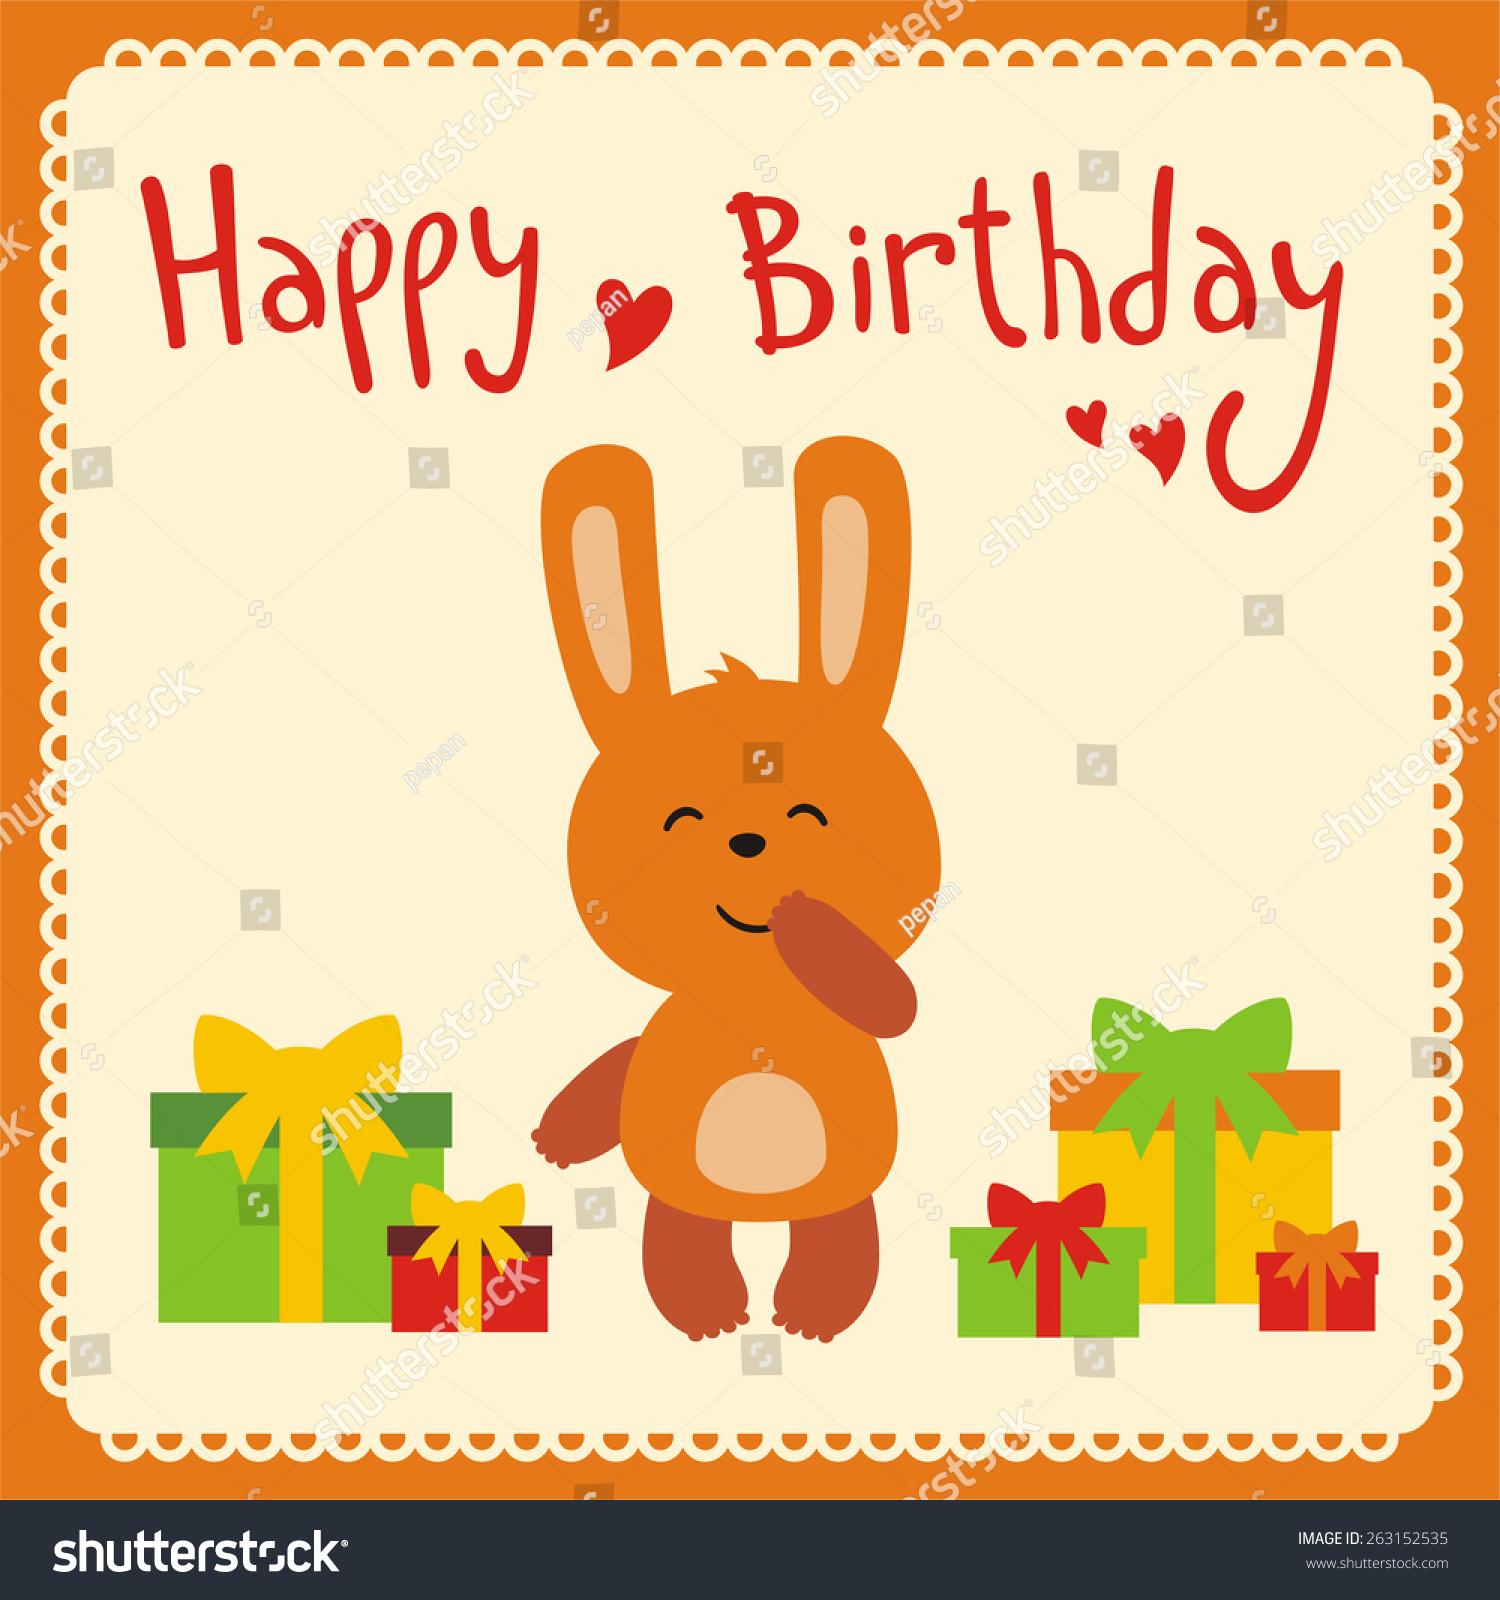 Happy Birthday Card Cute Rabbit Vector 263152535 Shutterstock – Happy Birthday Card Cute